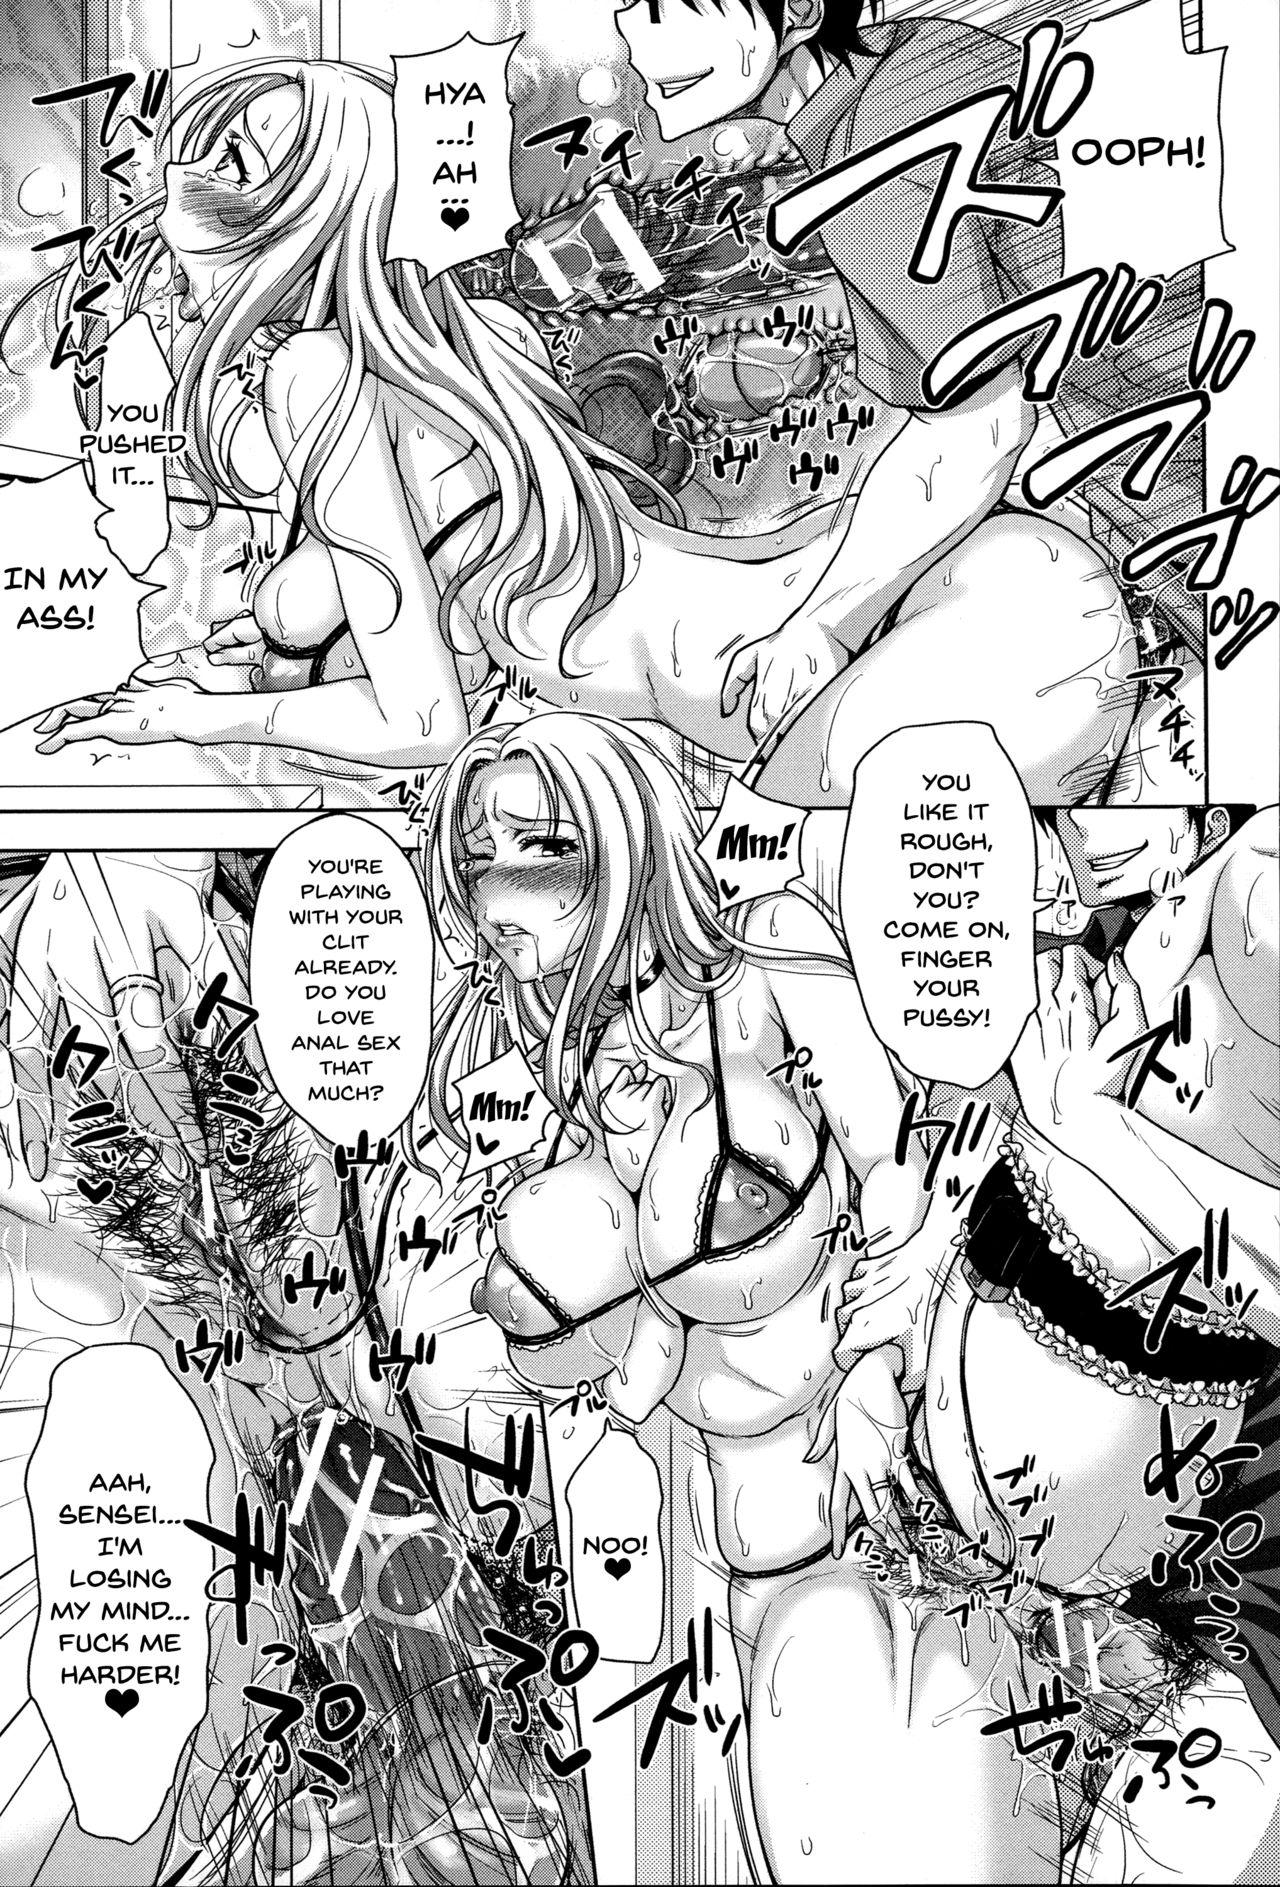 [Takuwan] Pakotate! Seikouritsu 0% no Teppeki Bishojo VS Seikouritsu 100% no Hentai Katei Kyoushi   Pakotate! Sex Rate 0% Iron-Willed Beautiful Virgins VS Sex Rate 100% Perverted Coach Ch.1-5 [English] {Doujins.com} 28